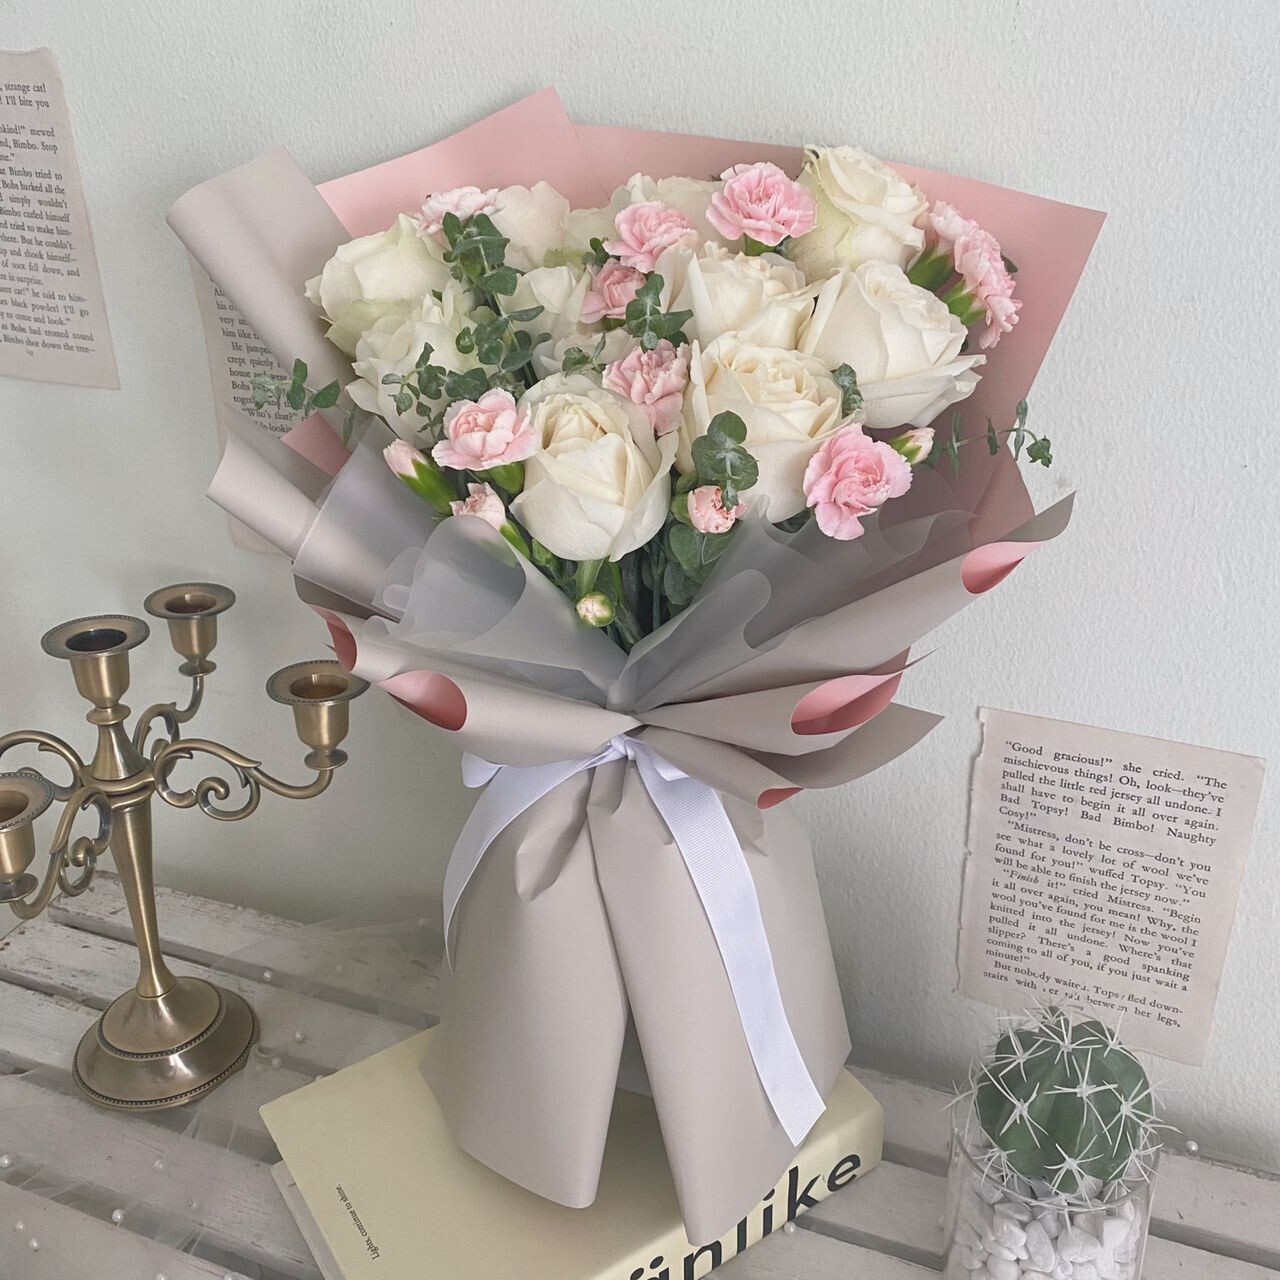 Minimalist White Rose Flower Bouquet (By: Rainbow Flower Station from Cheras)